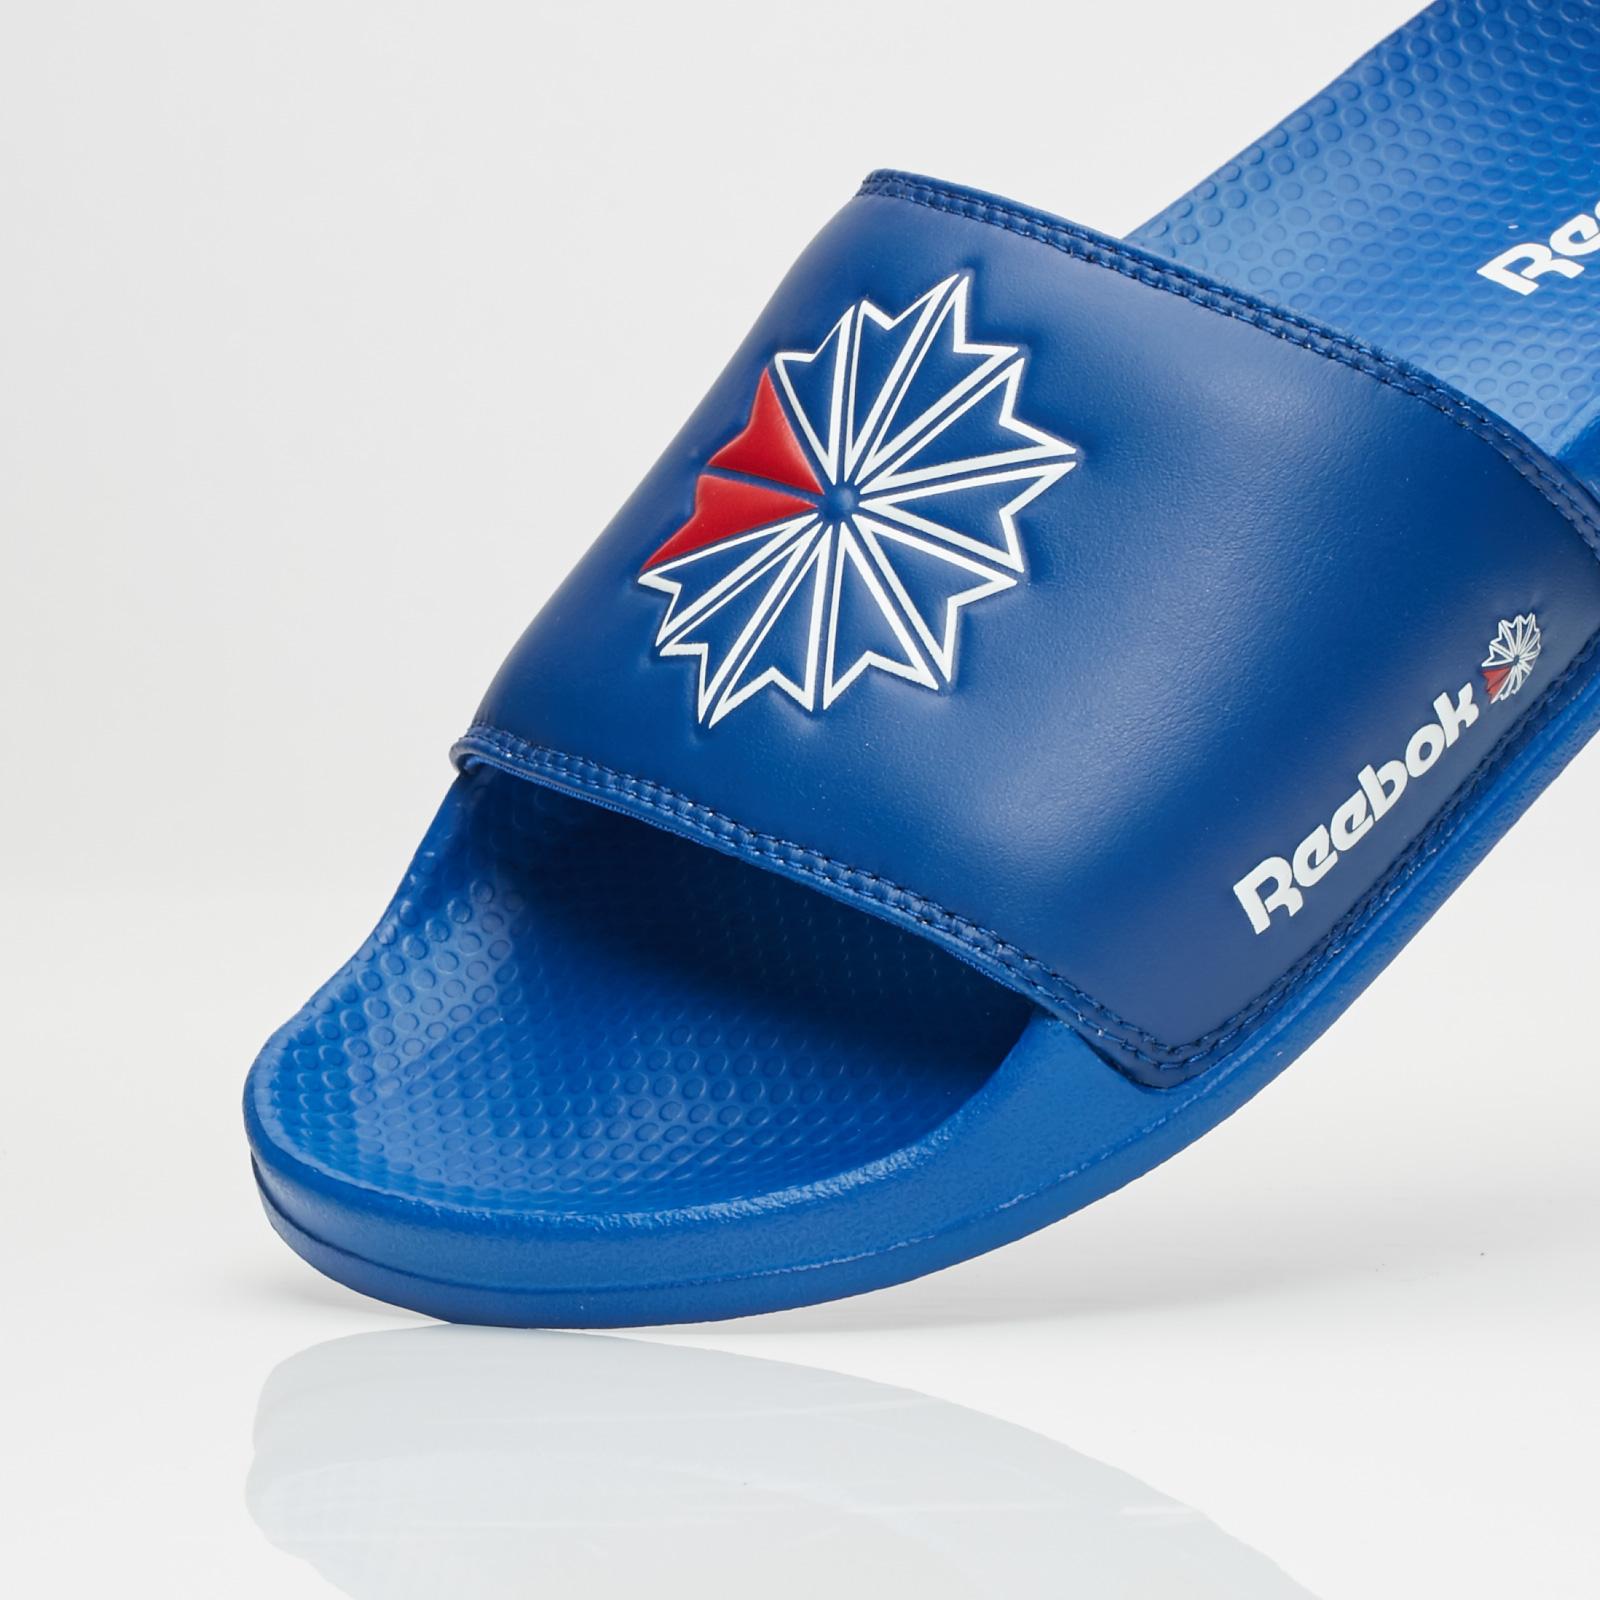 d5f1350c4 Reebok Classic Slide - Cn0740 - Sneakersnstuff